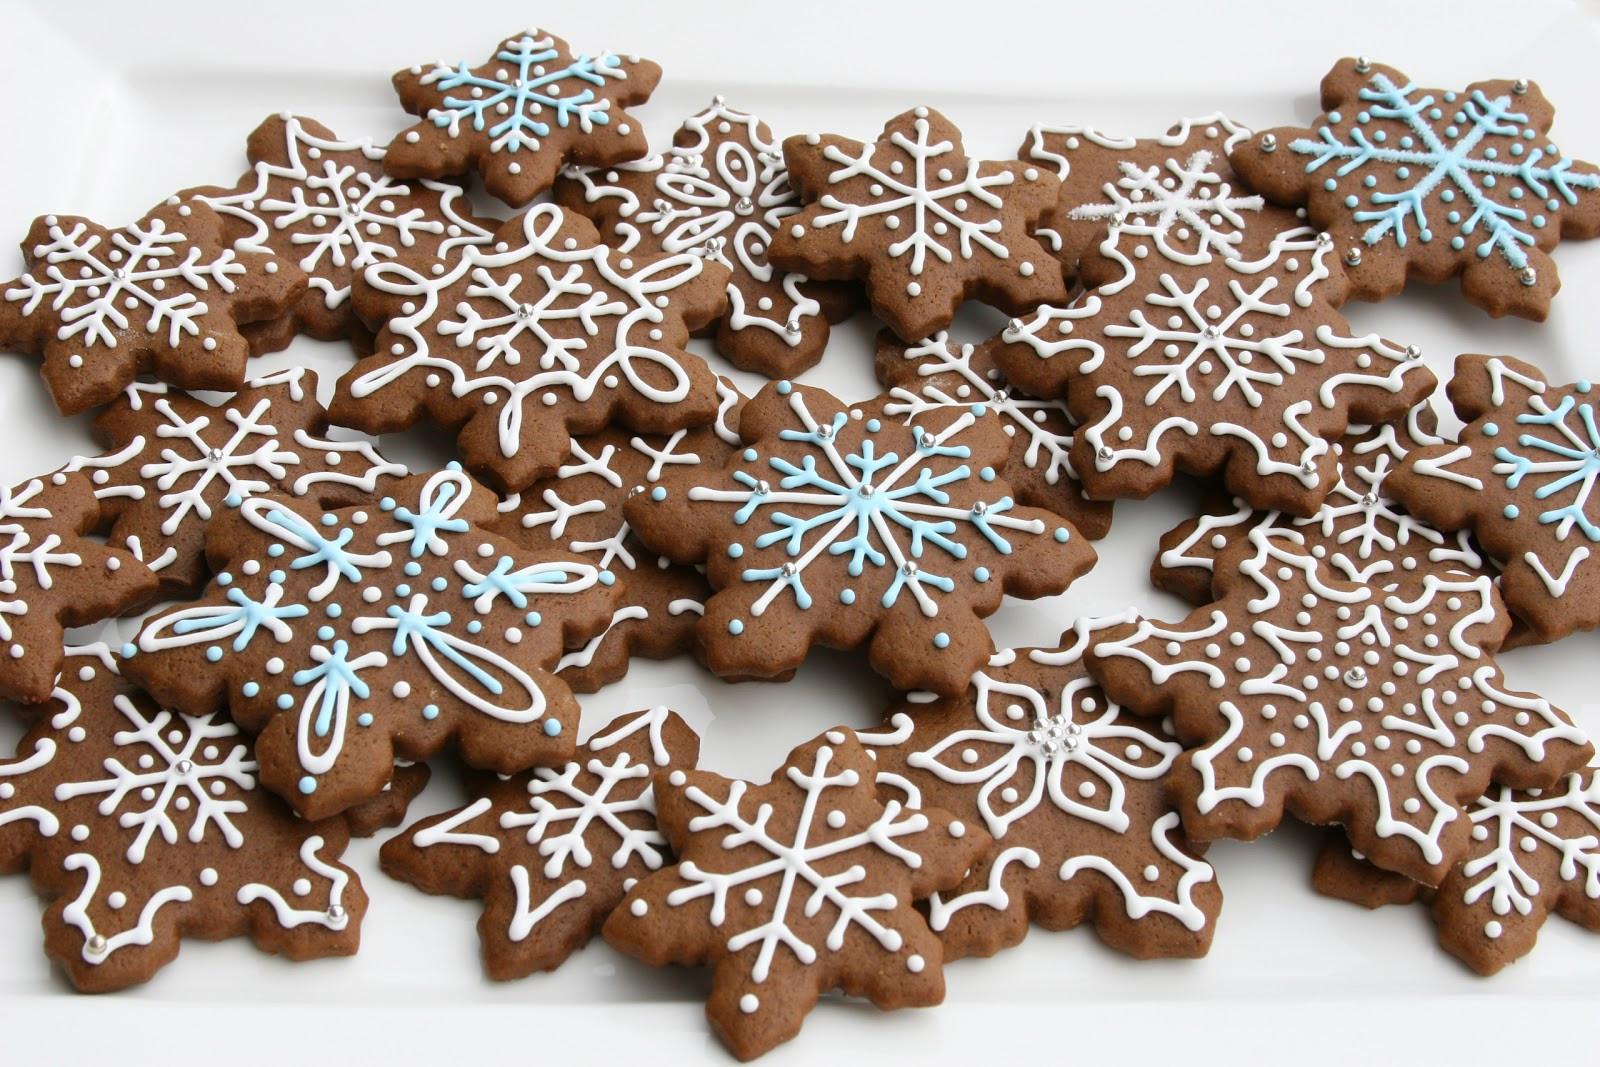 Gingerbread Cookies Recipe  Gingerbread Cookies Recipe – Glorious Treats